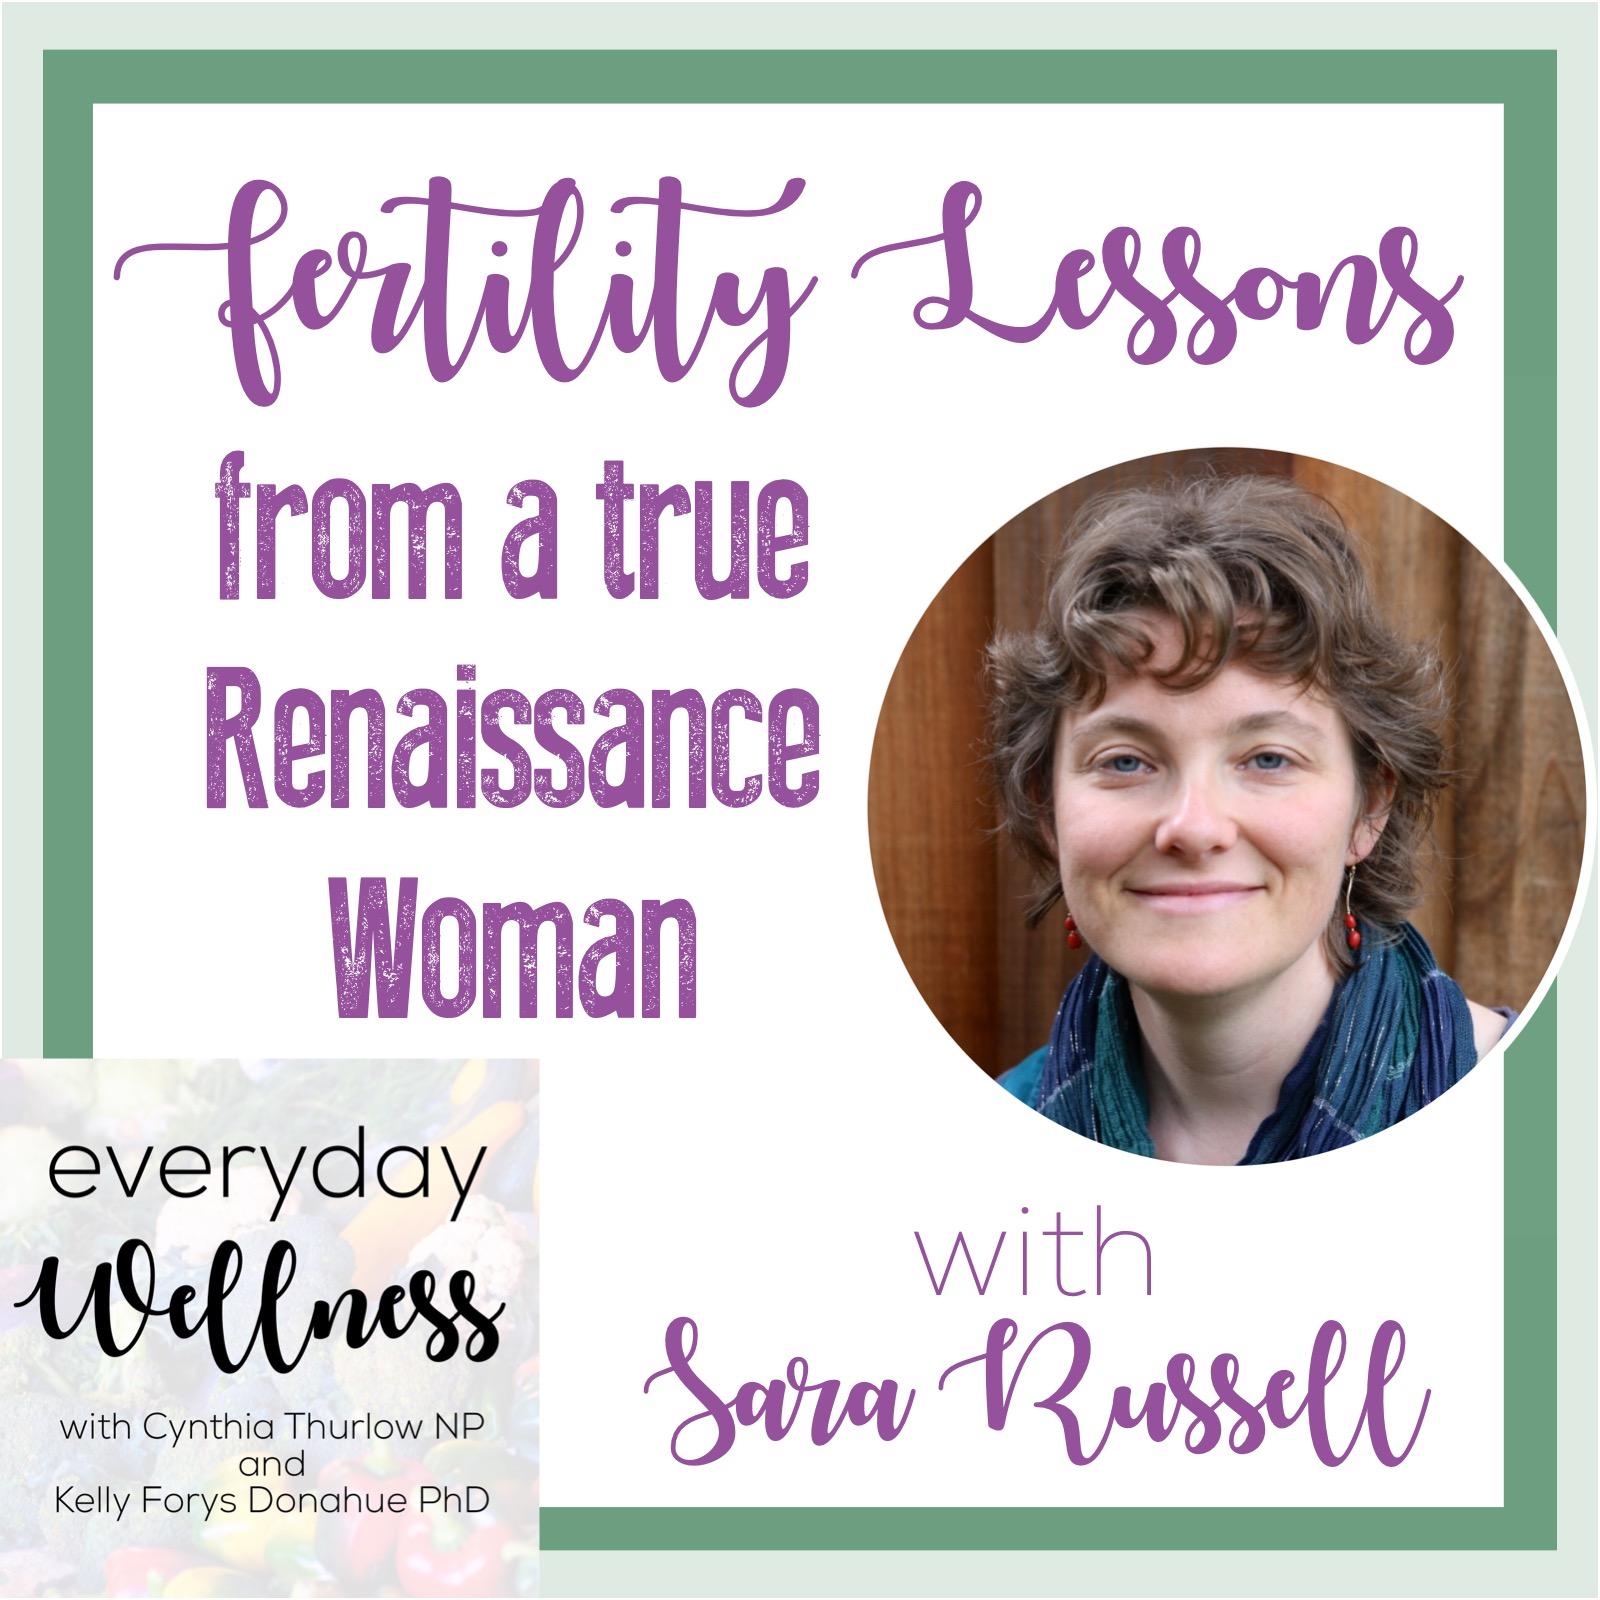 Episode 2: Sara Russell